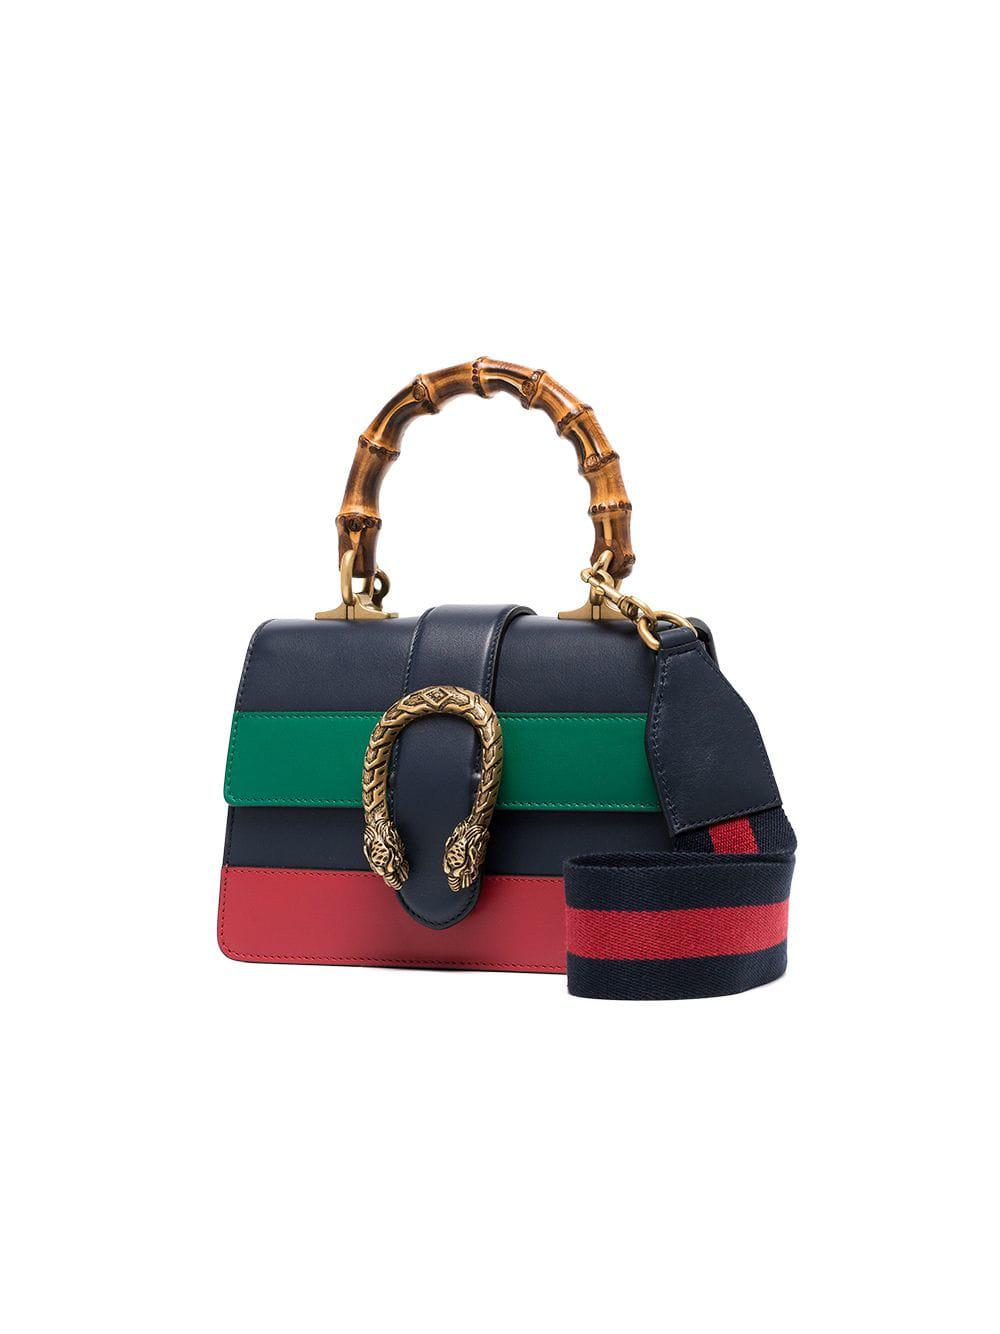 4b49cb879298 Gucci - Blue Green And Red Dionysus Mini Top Handle Bag - Lyst. View  fullscreen